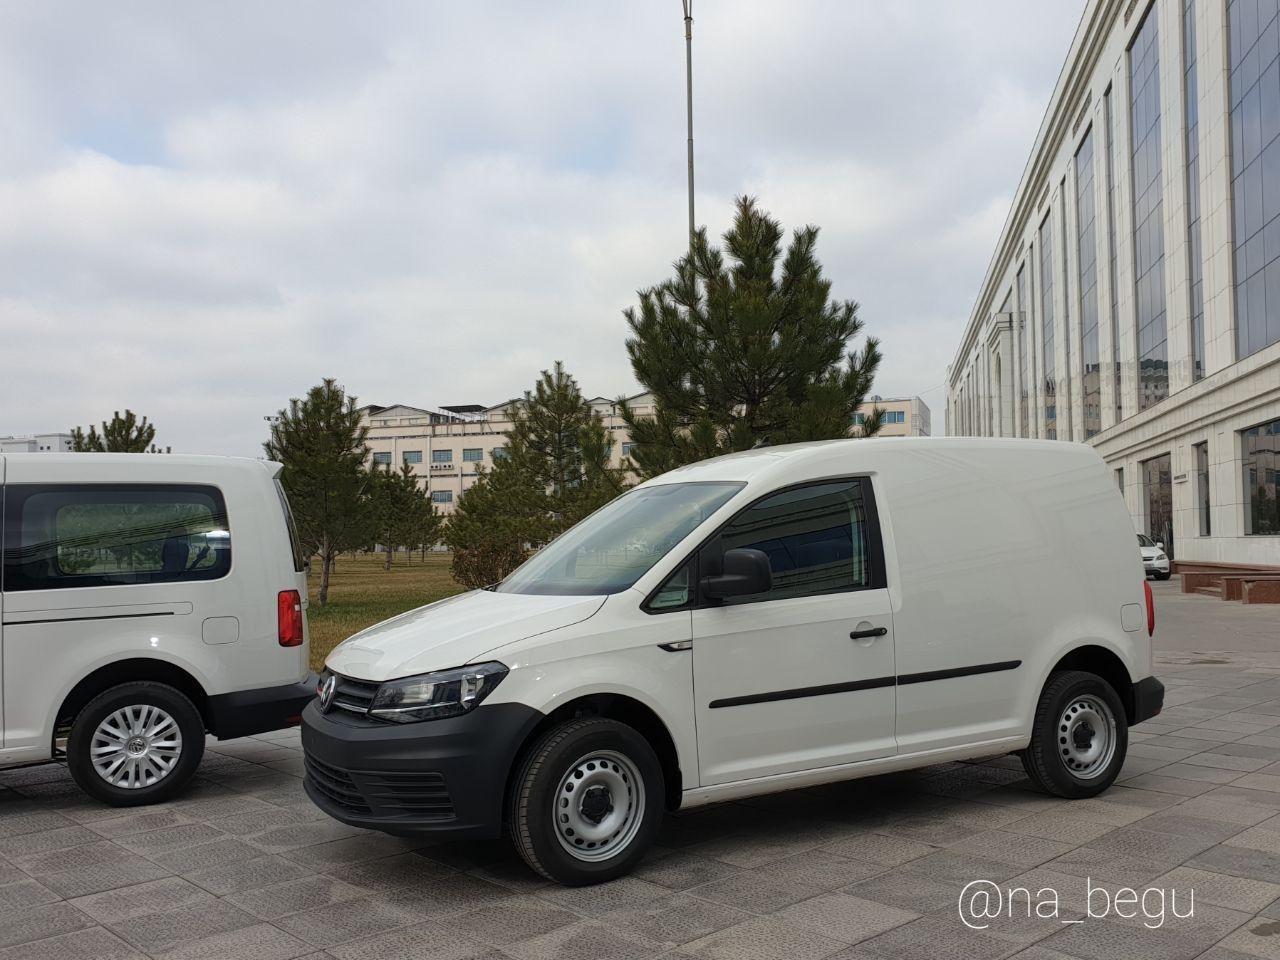 Volkswagen Caddy Narxi - Цена на Кэдди в Узбекистане - 5